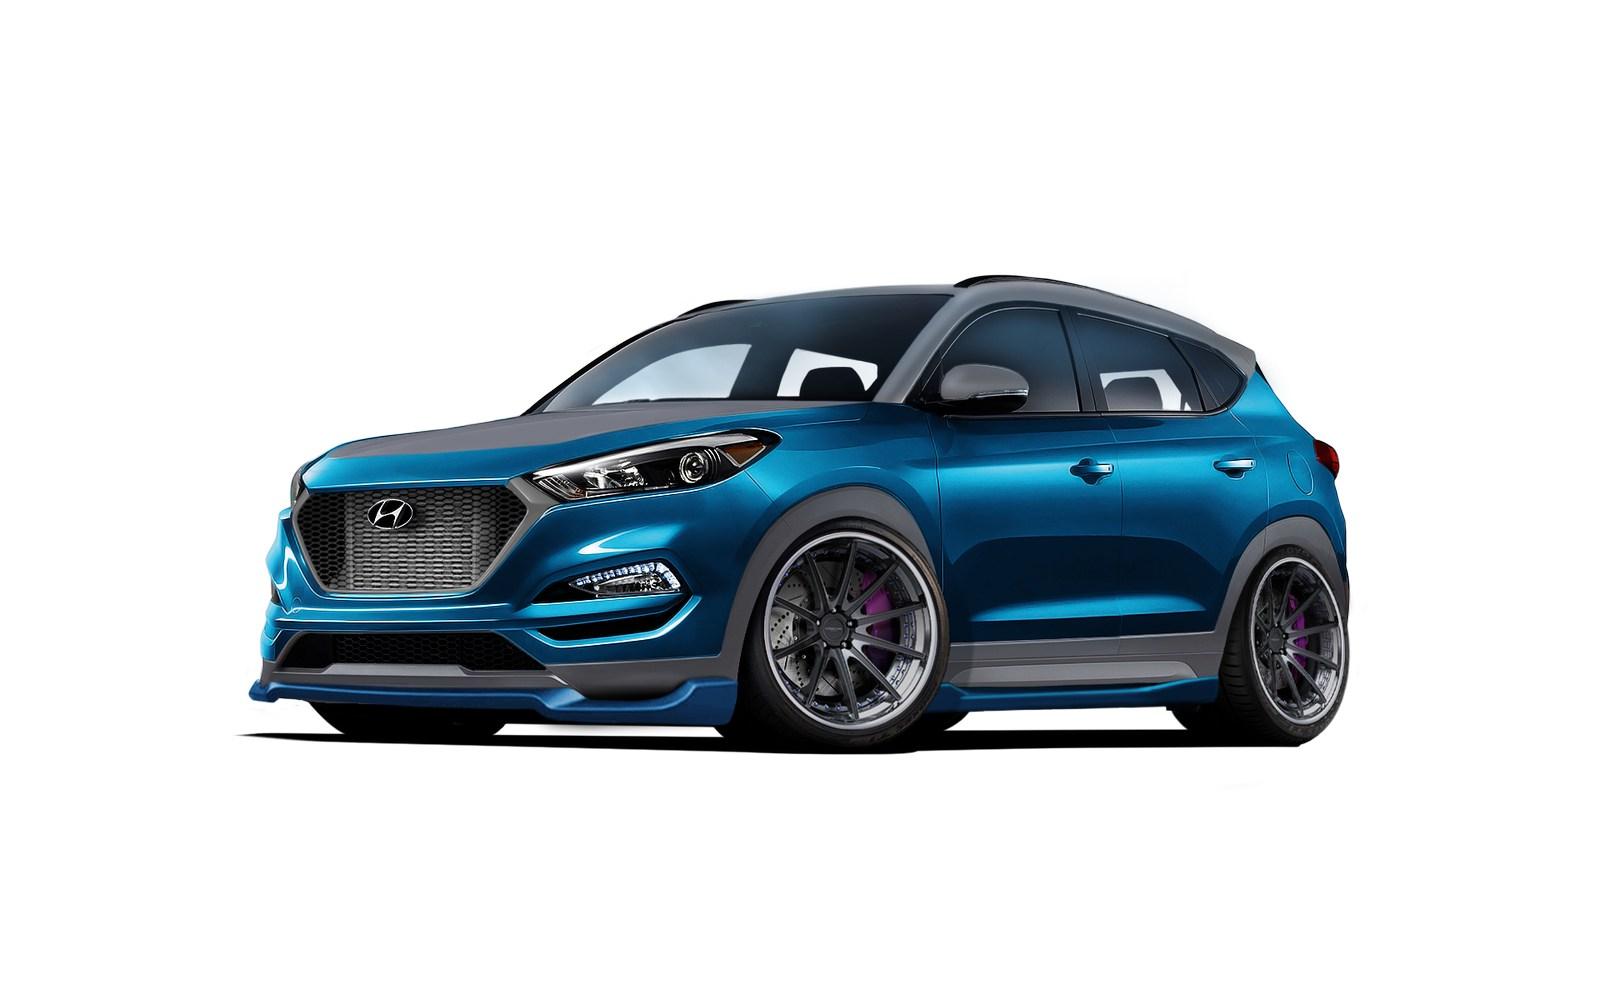 Hyundai-Vaccar-Tucson-Sport-Concept-6